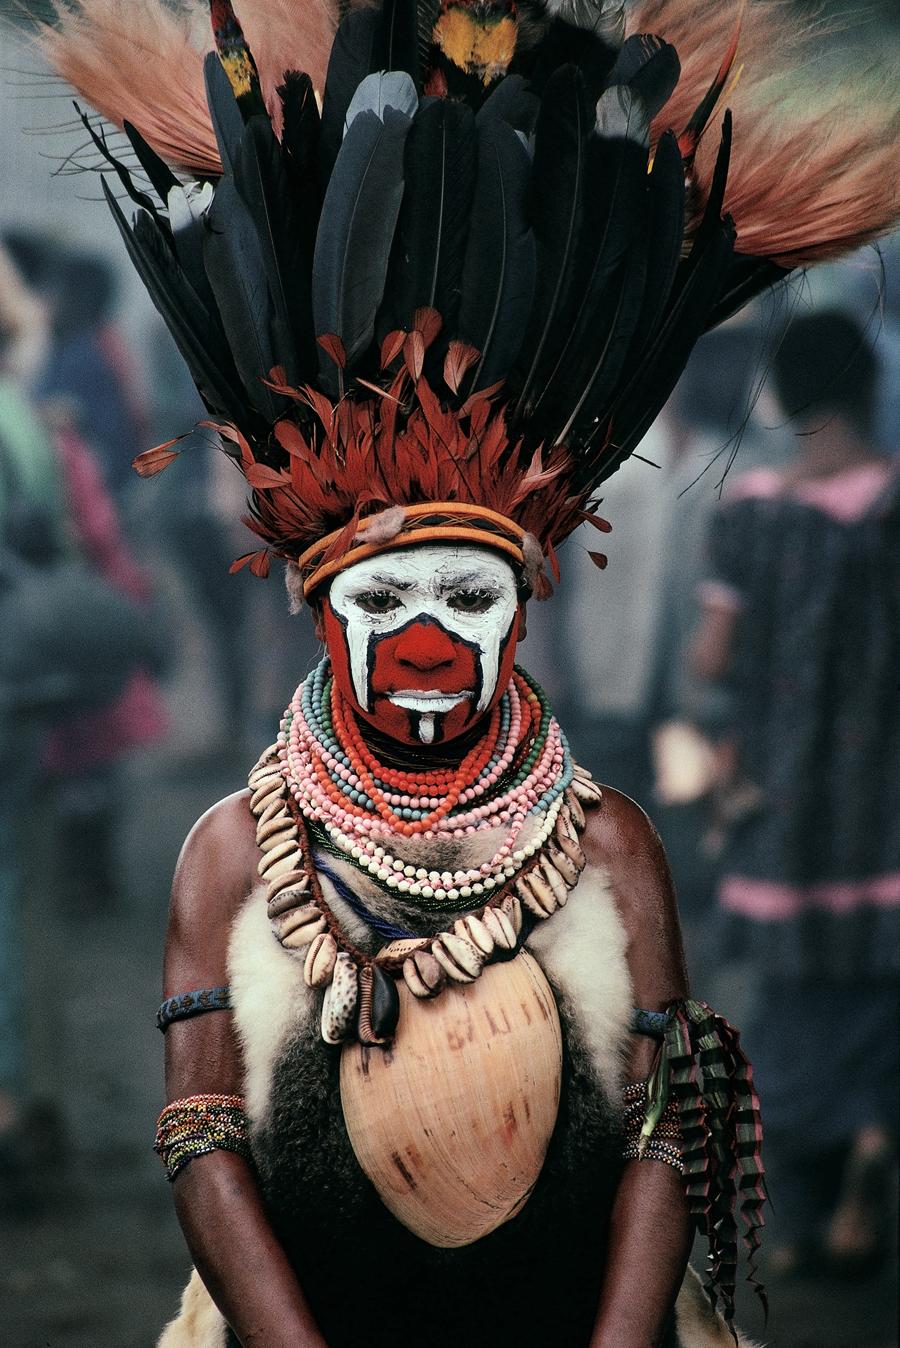 "Cary Wolinsky  New Guinea Dancer, Mt. Hagan, Papua New Guinea  Archival inkjet print 27 x 18"" CW25"